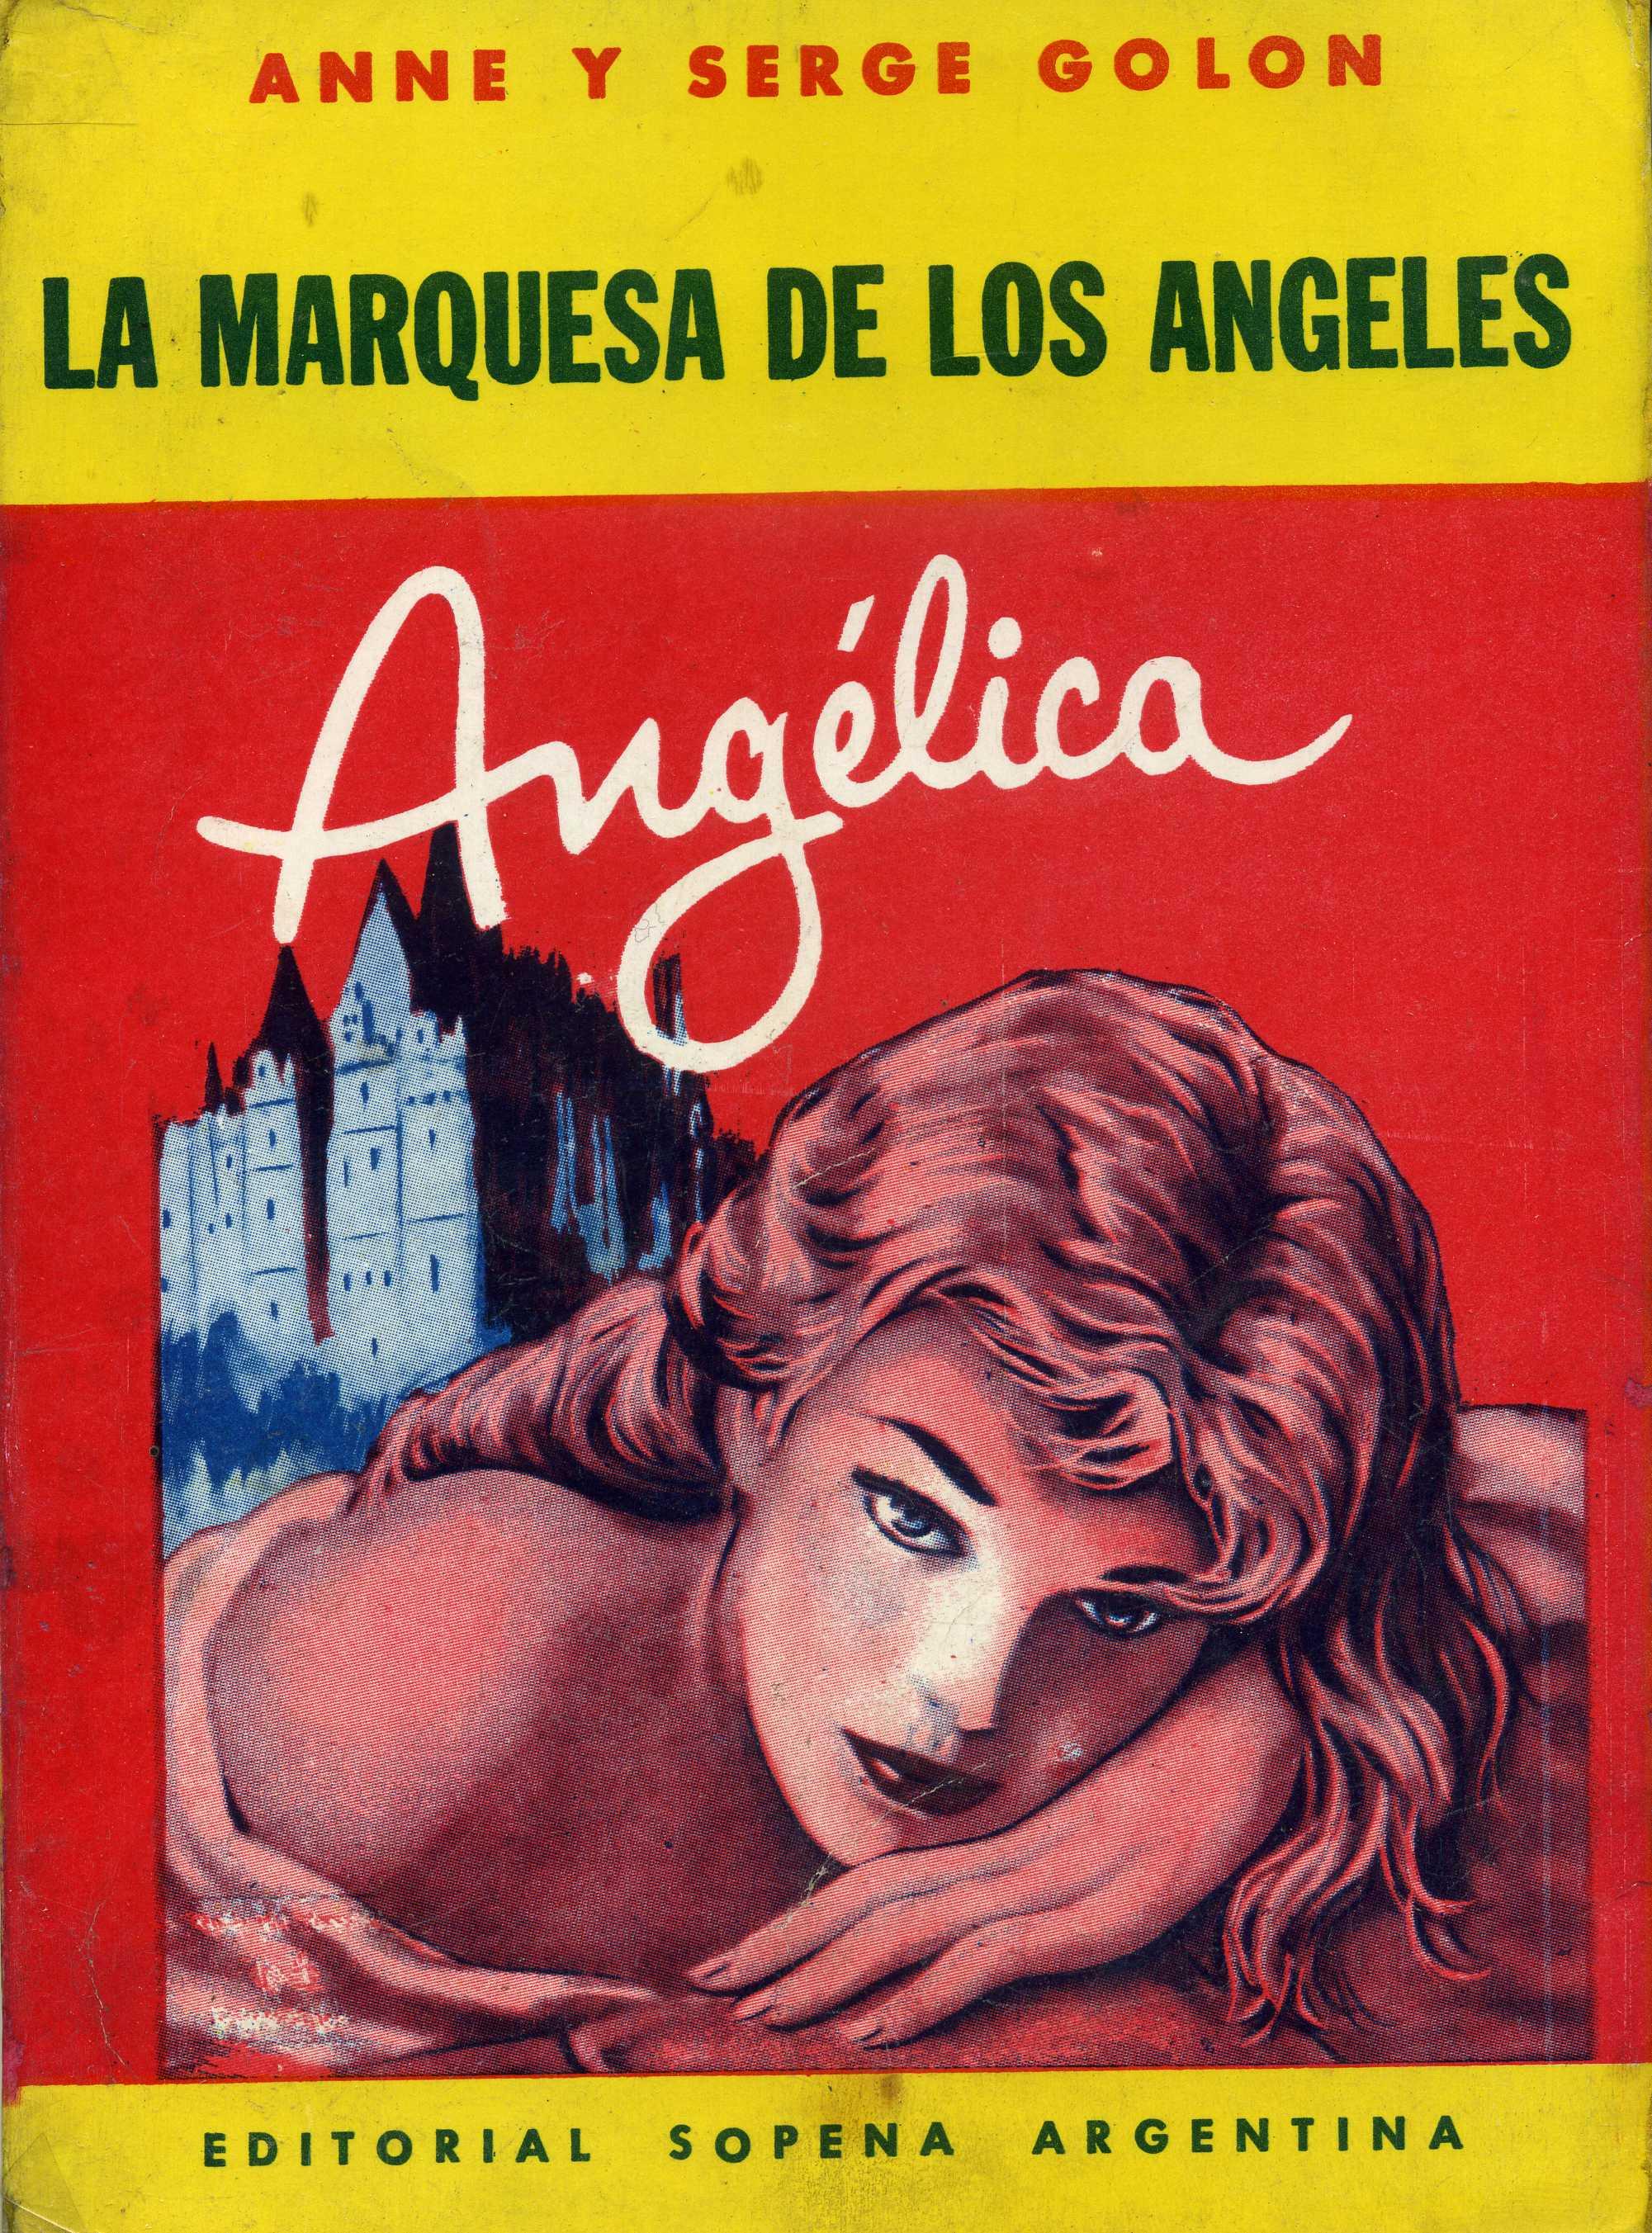 La marquesa de los Angeles I